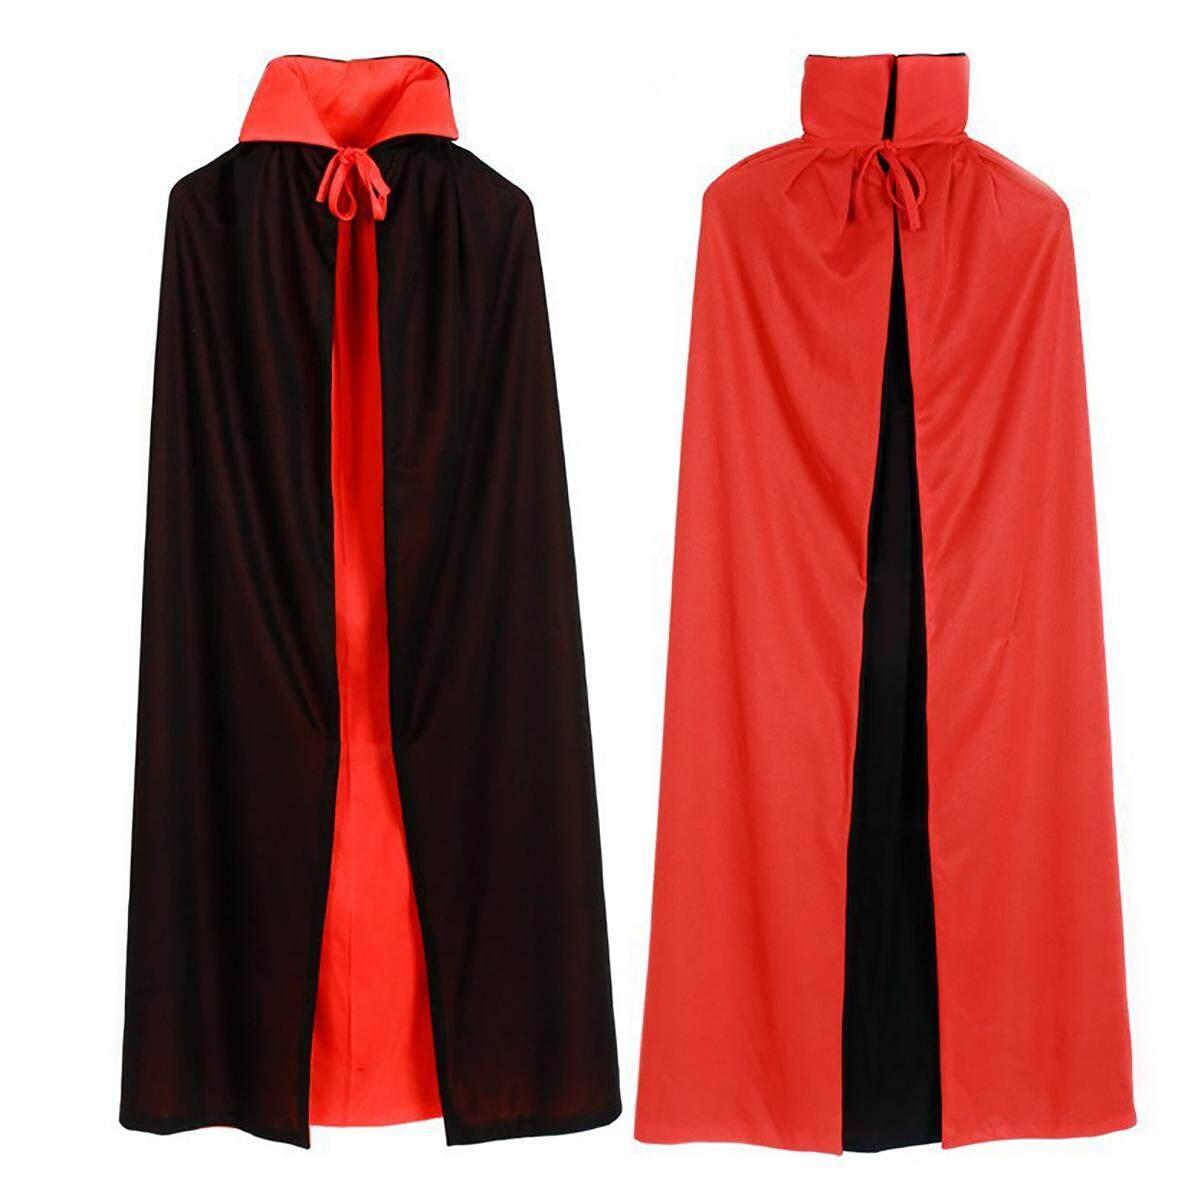 Halloween Vampire Black&Red Cloak Dracula Cape Adult Kids Cosplay Fancy Costume